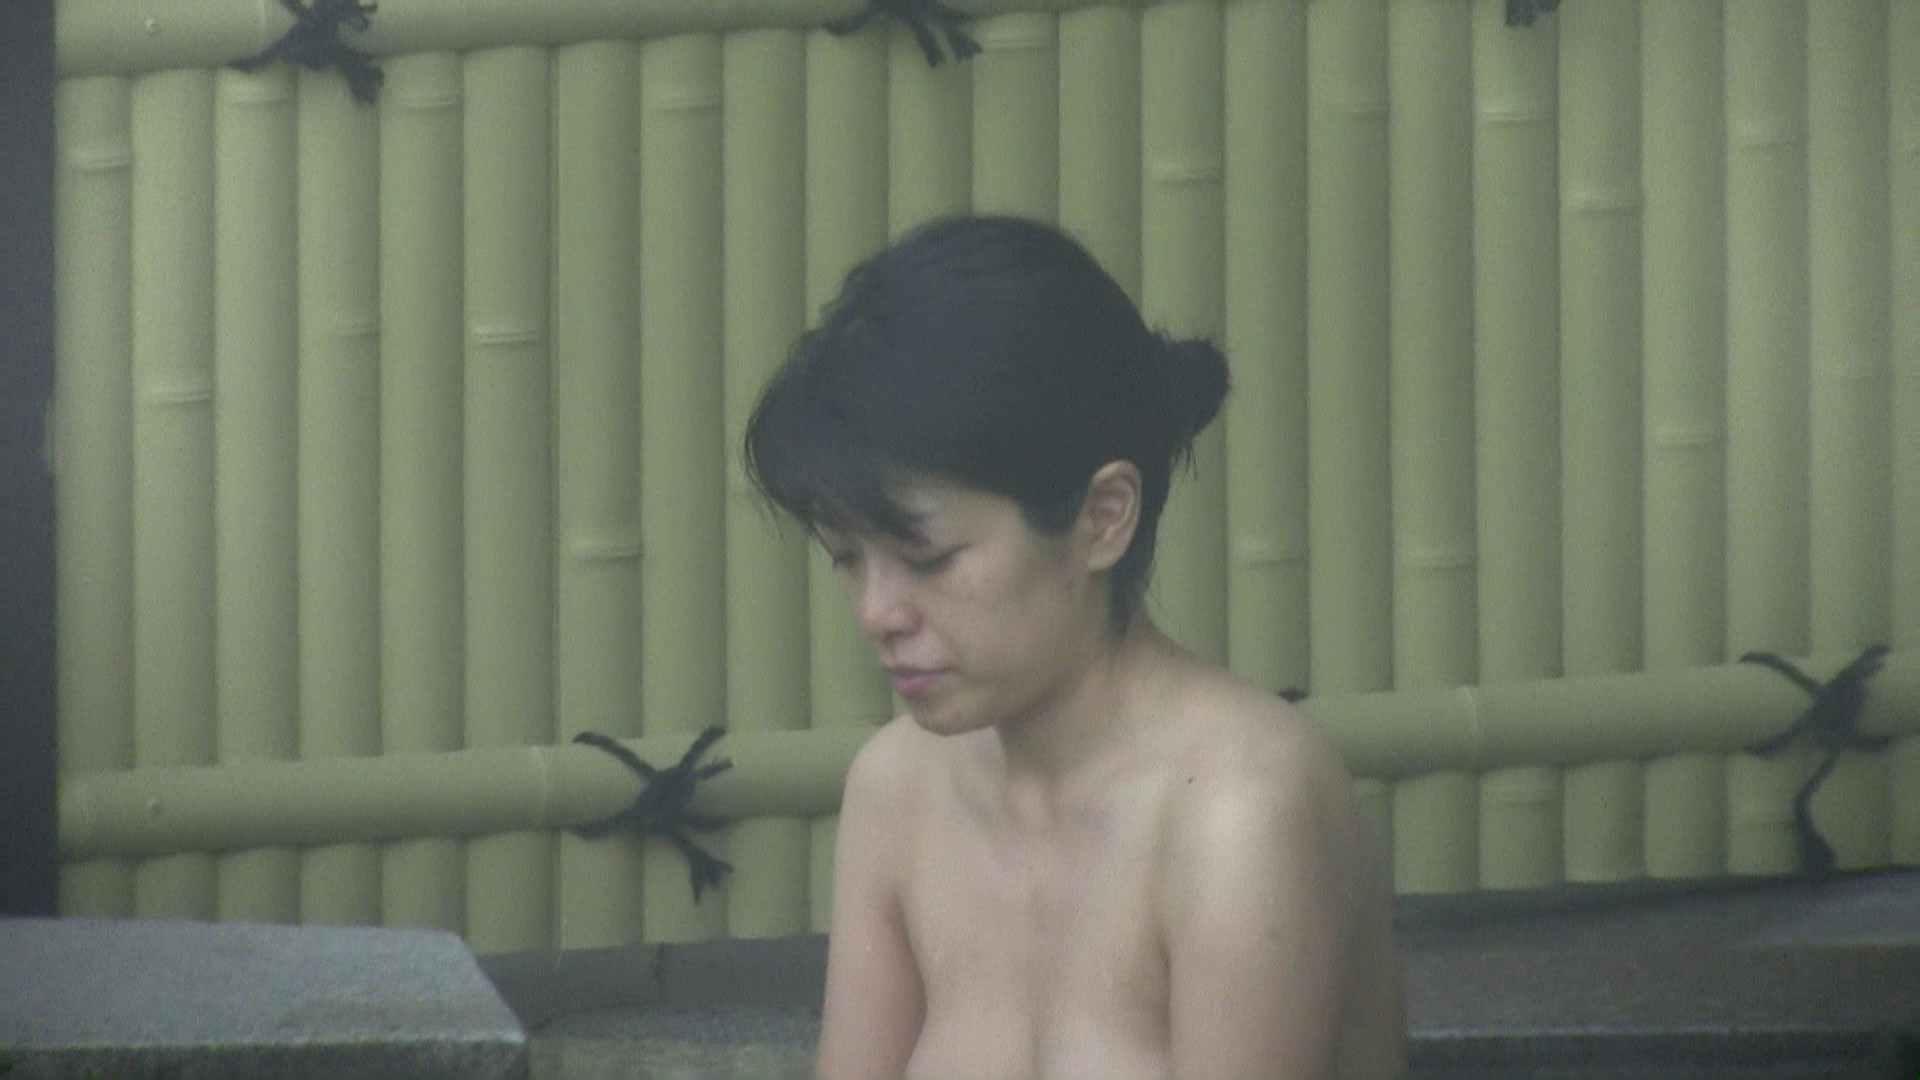 Aquaな露天風呂Vol.585 HなOL | 盗撮  93pic 36